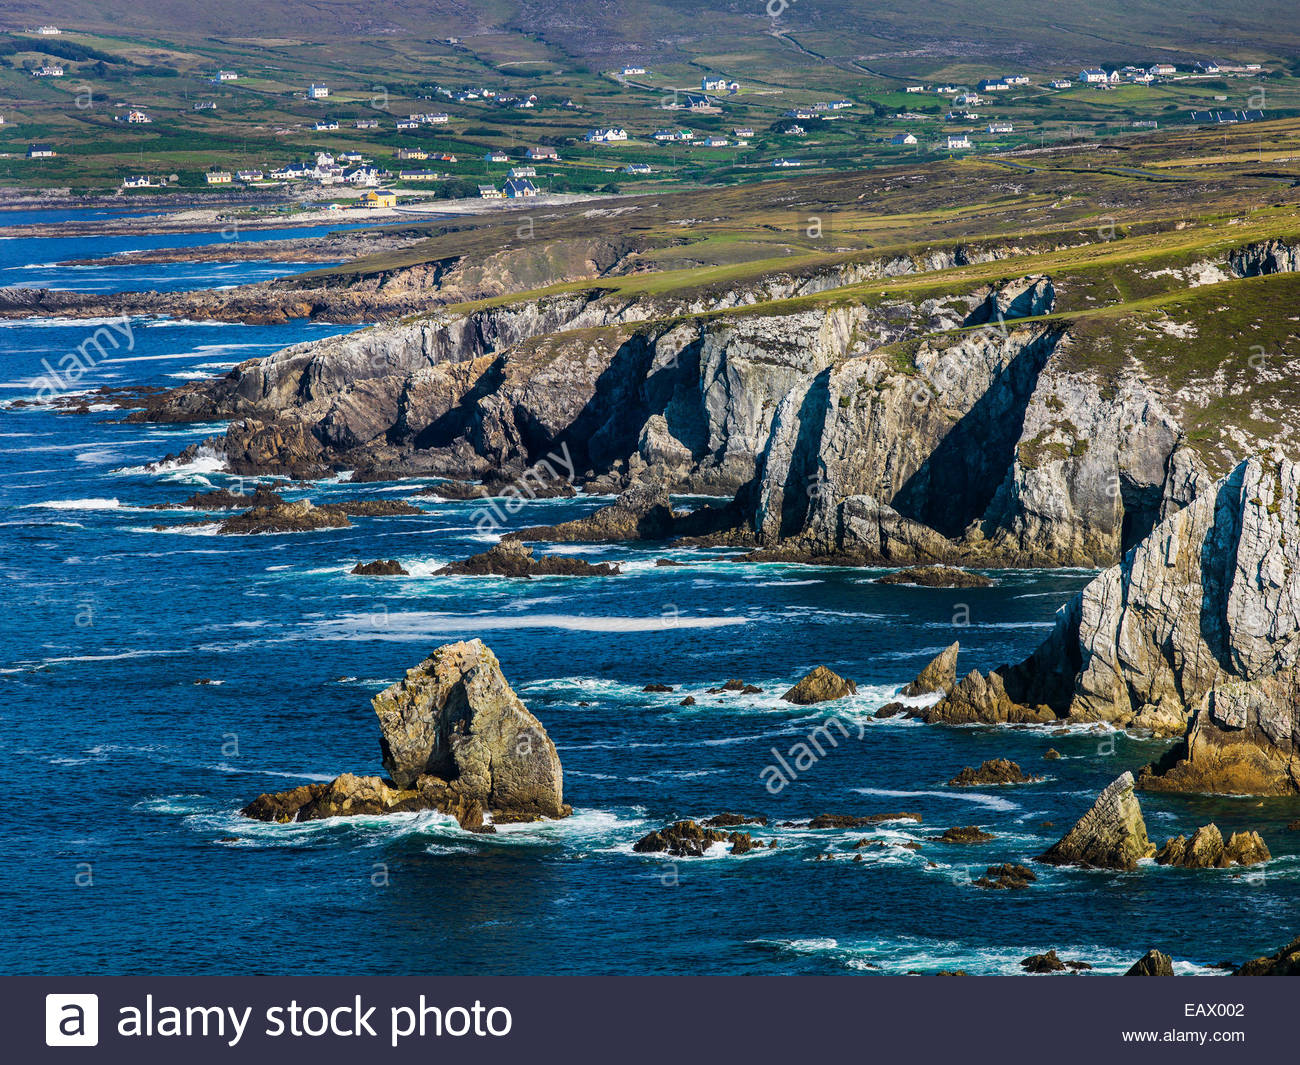 Coastline of Achill Island in County Mayo, Ireland. - Stock Image